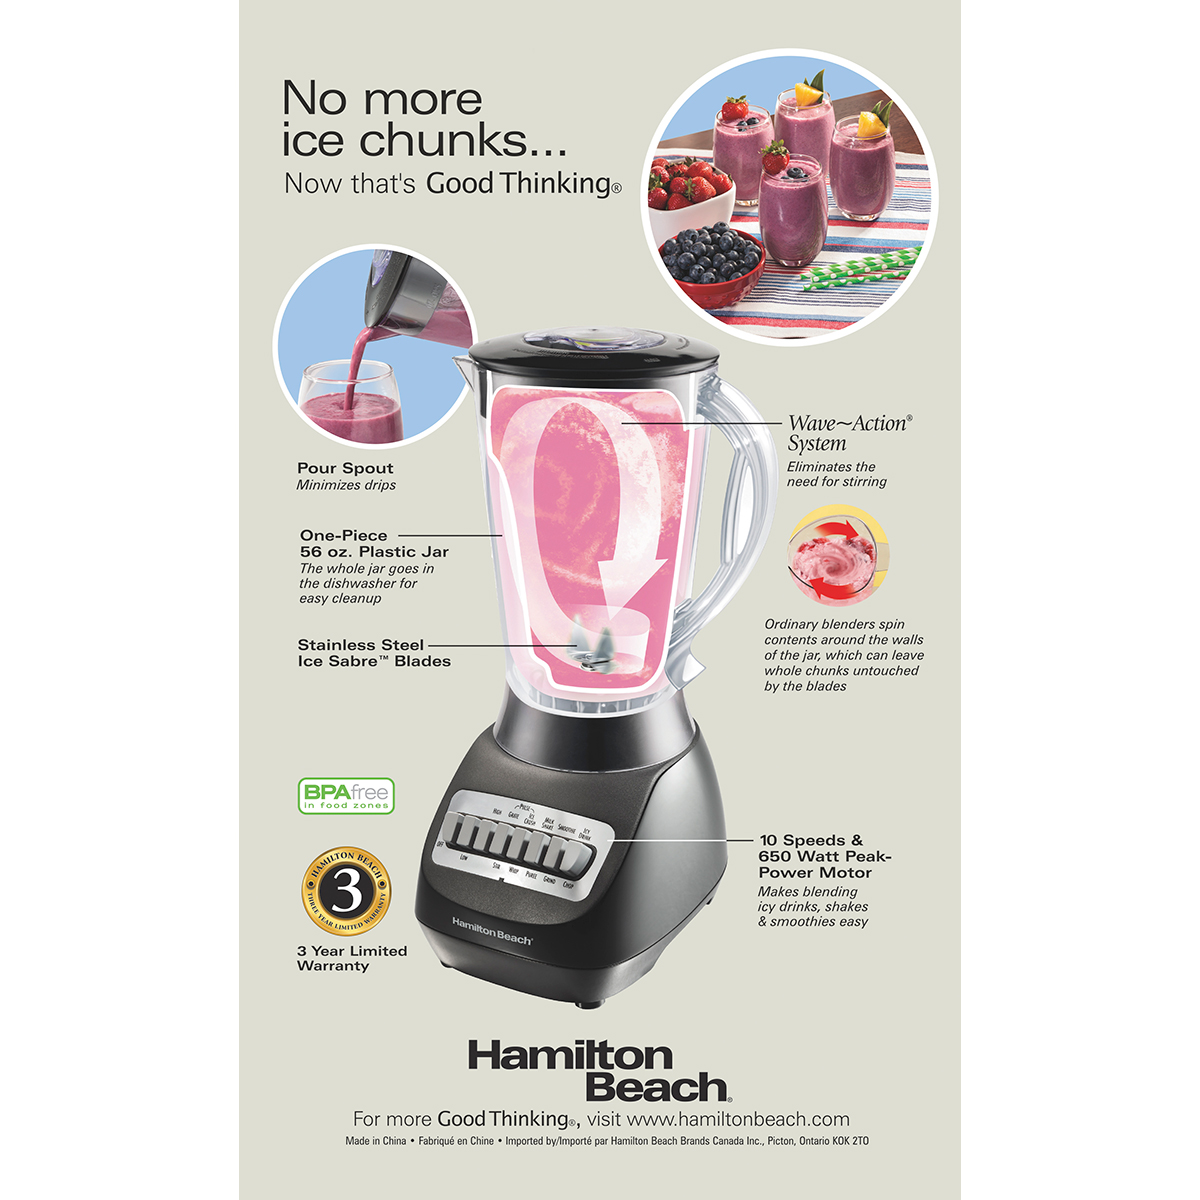 56 oz. Hamilton Beach Smoothie Electric Blender with 10 Speeds BPA-free Plastic